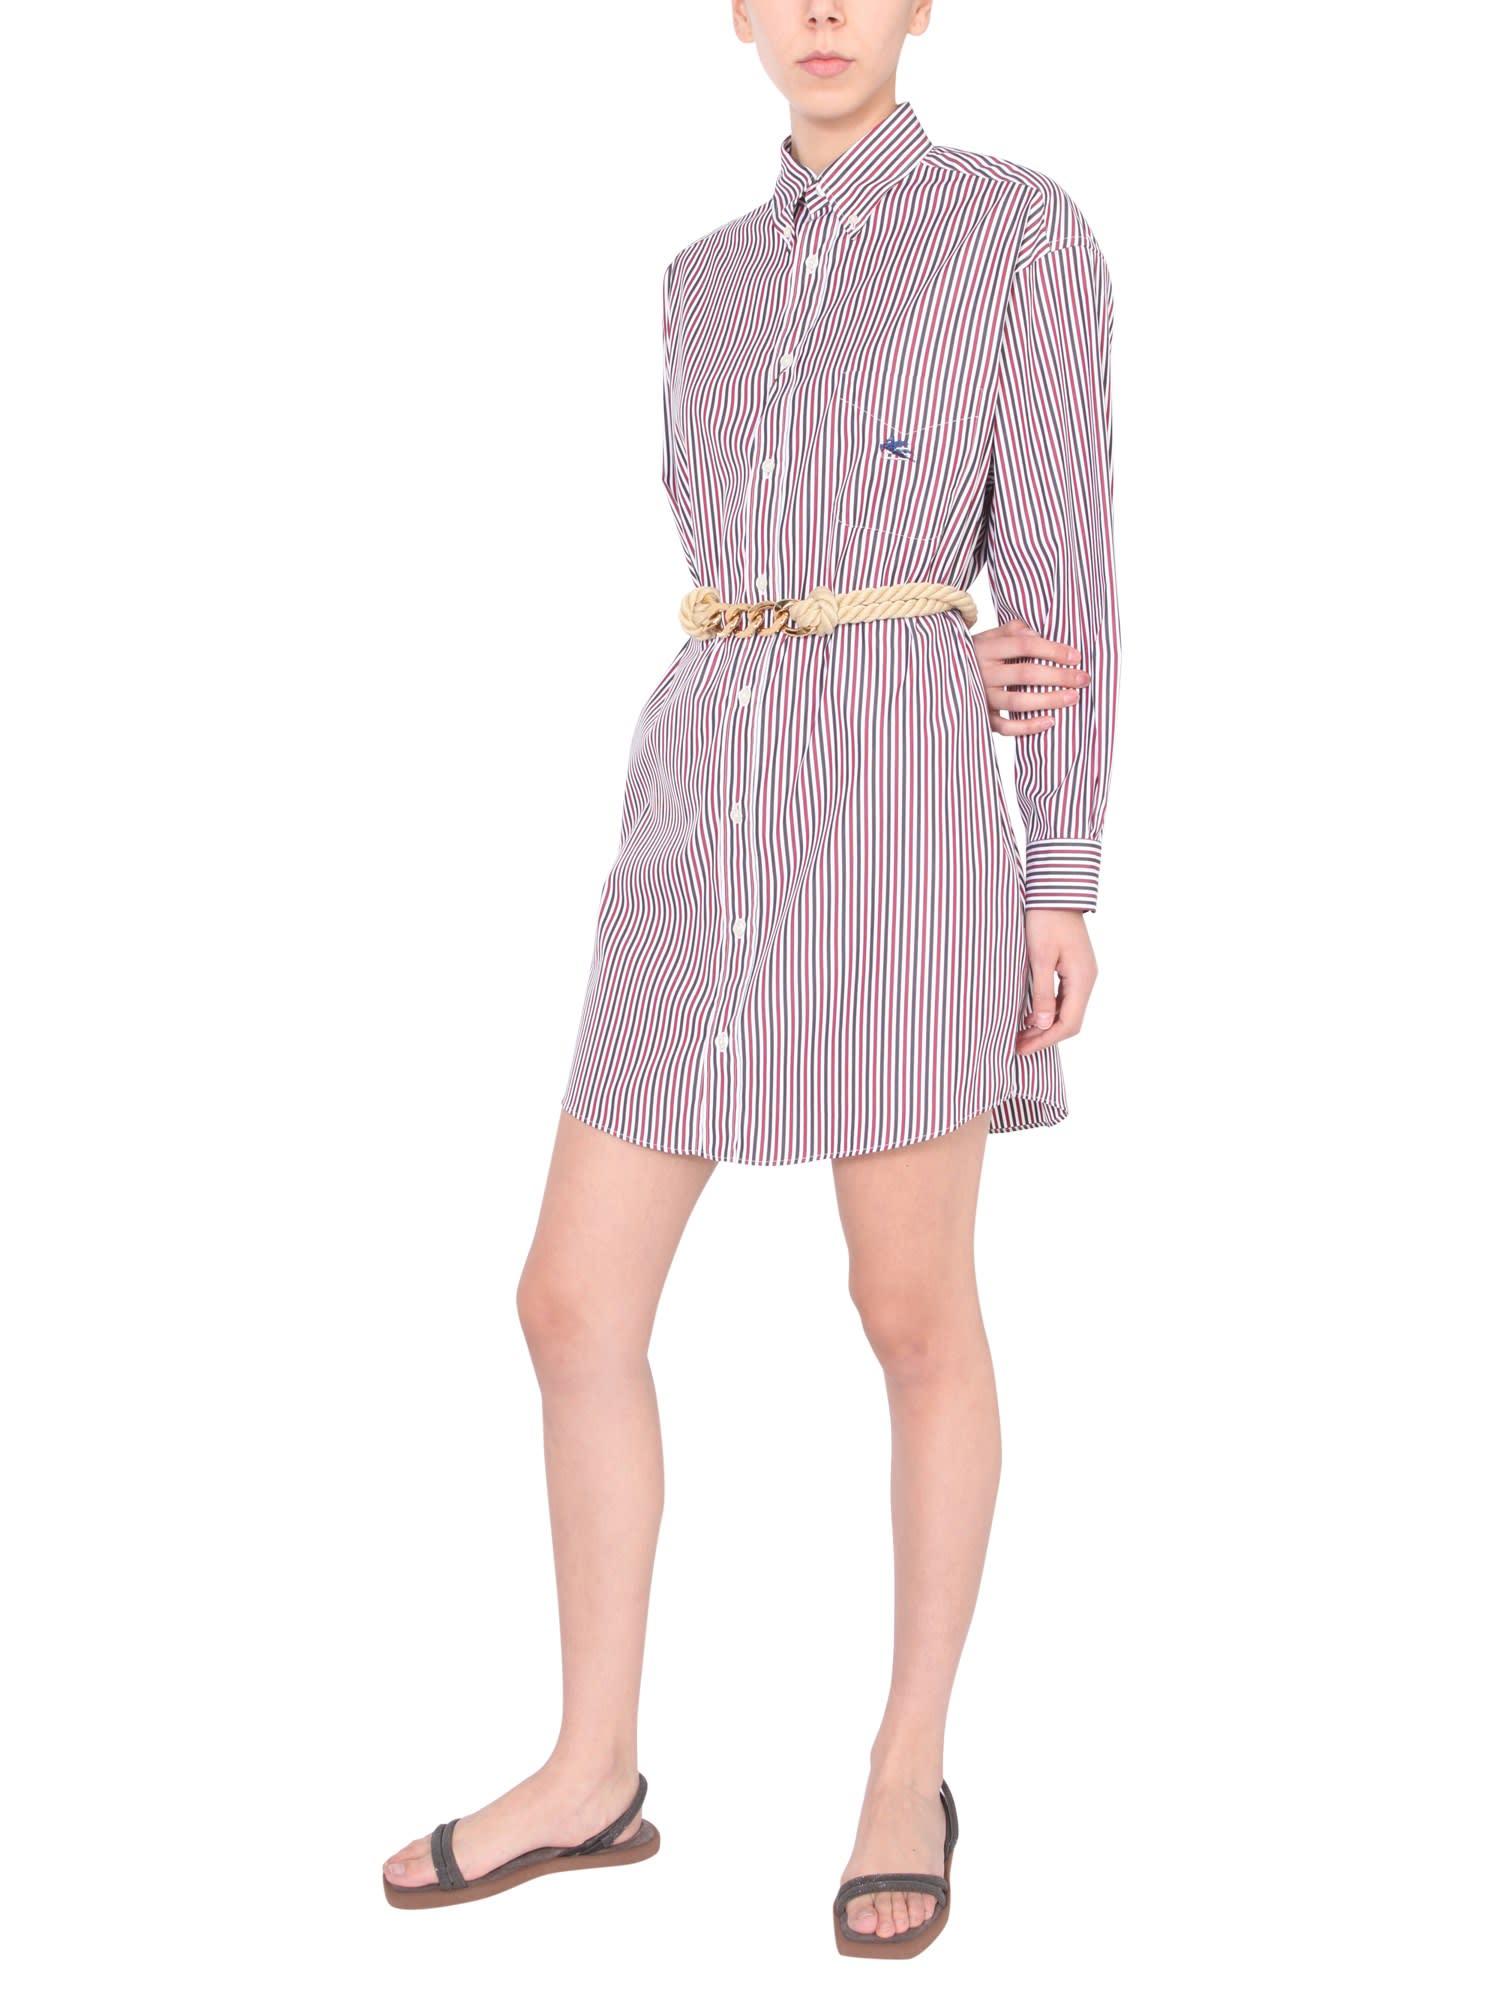 Etro Downs STRIPED SHIRT DRESS